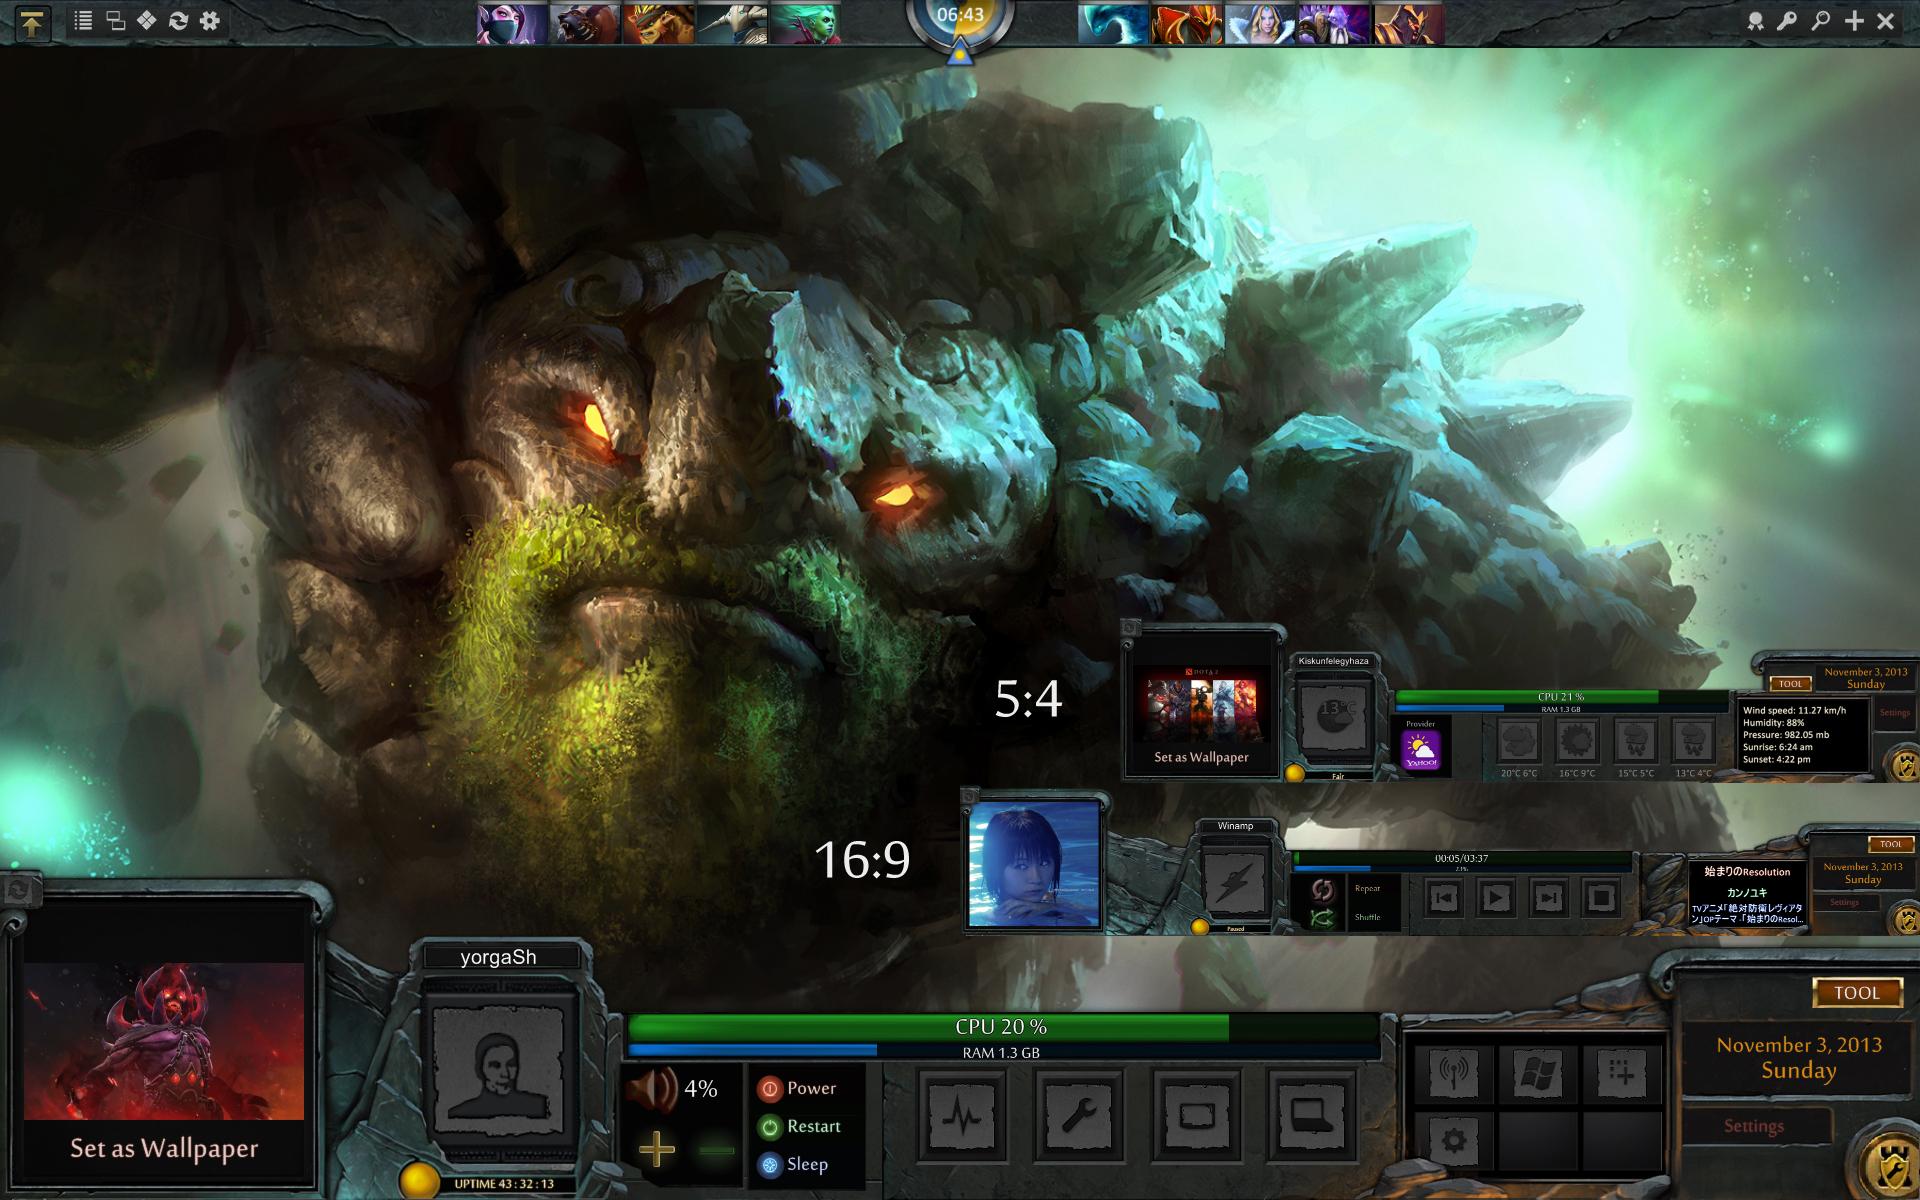 Dota2 Game HUD 1.01 by yorgash